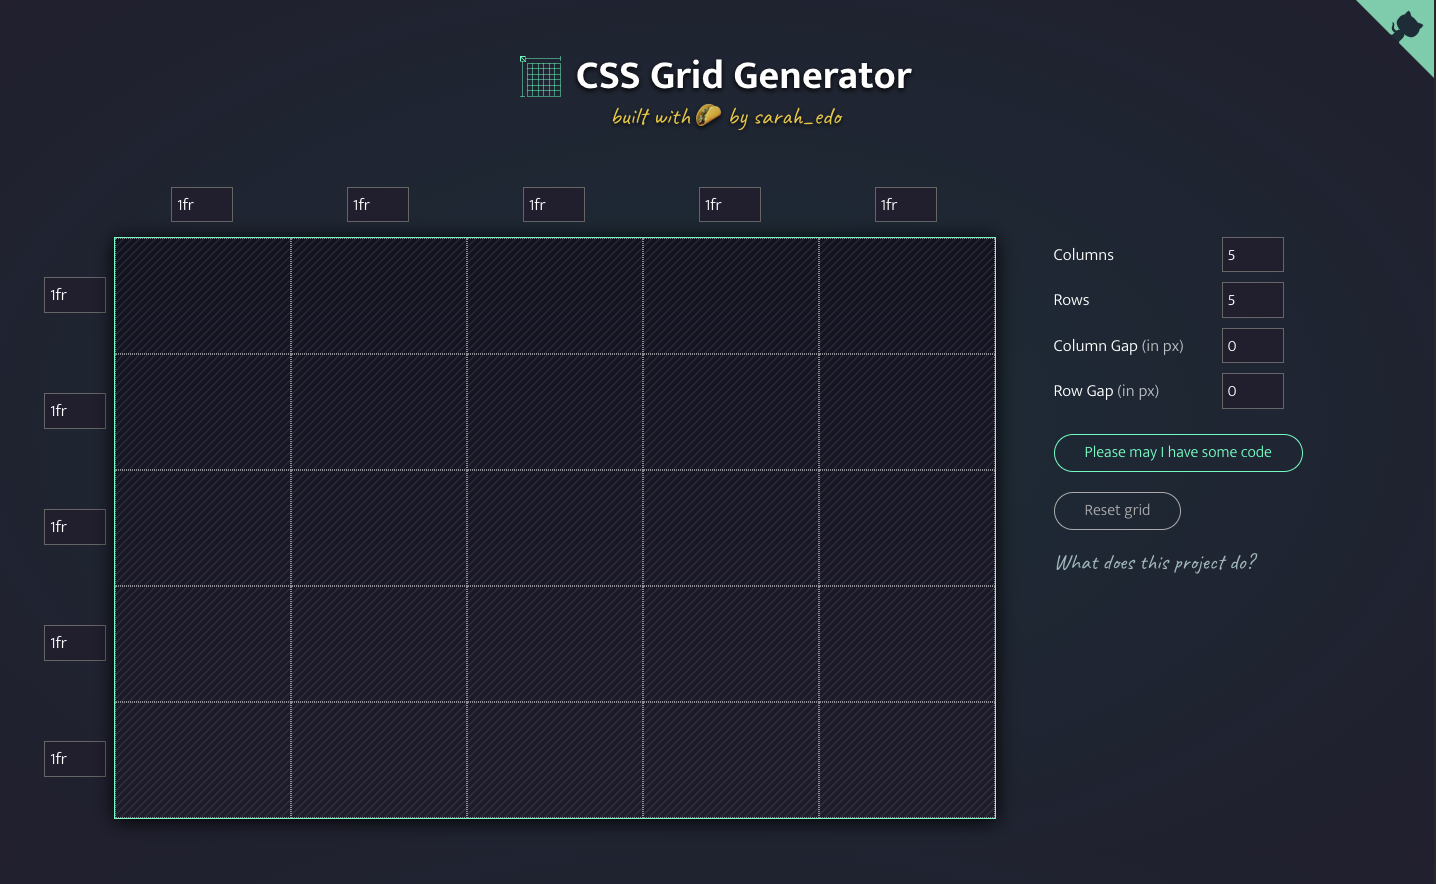 CSS Grid Generator by Sarah Drasner